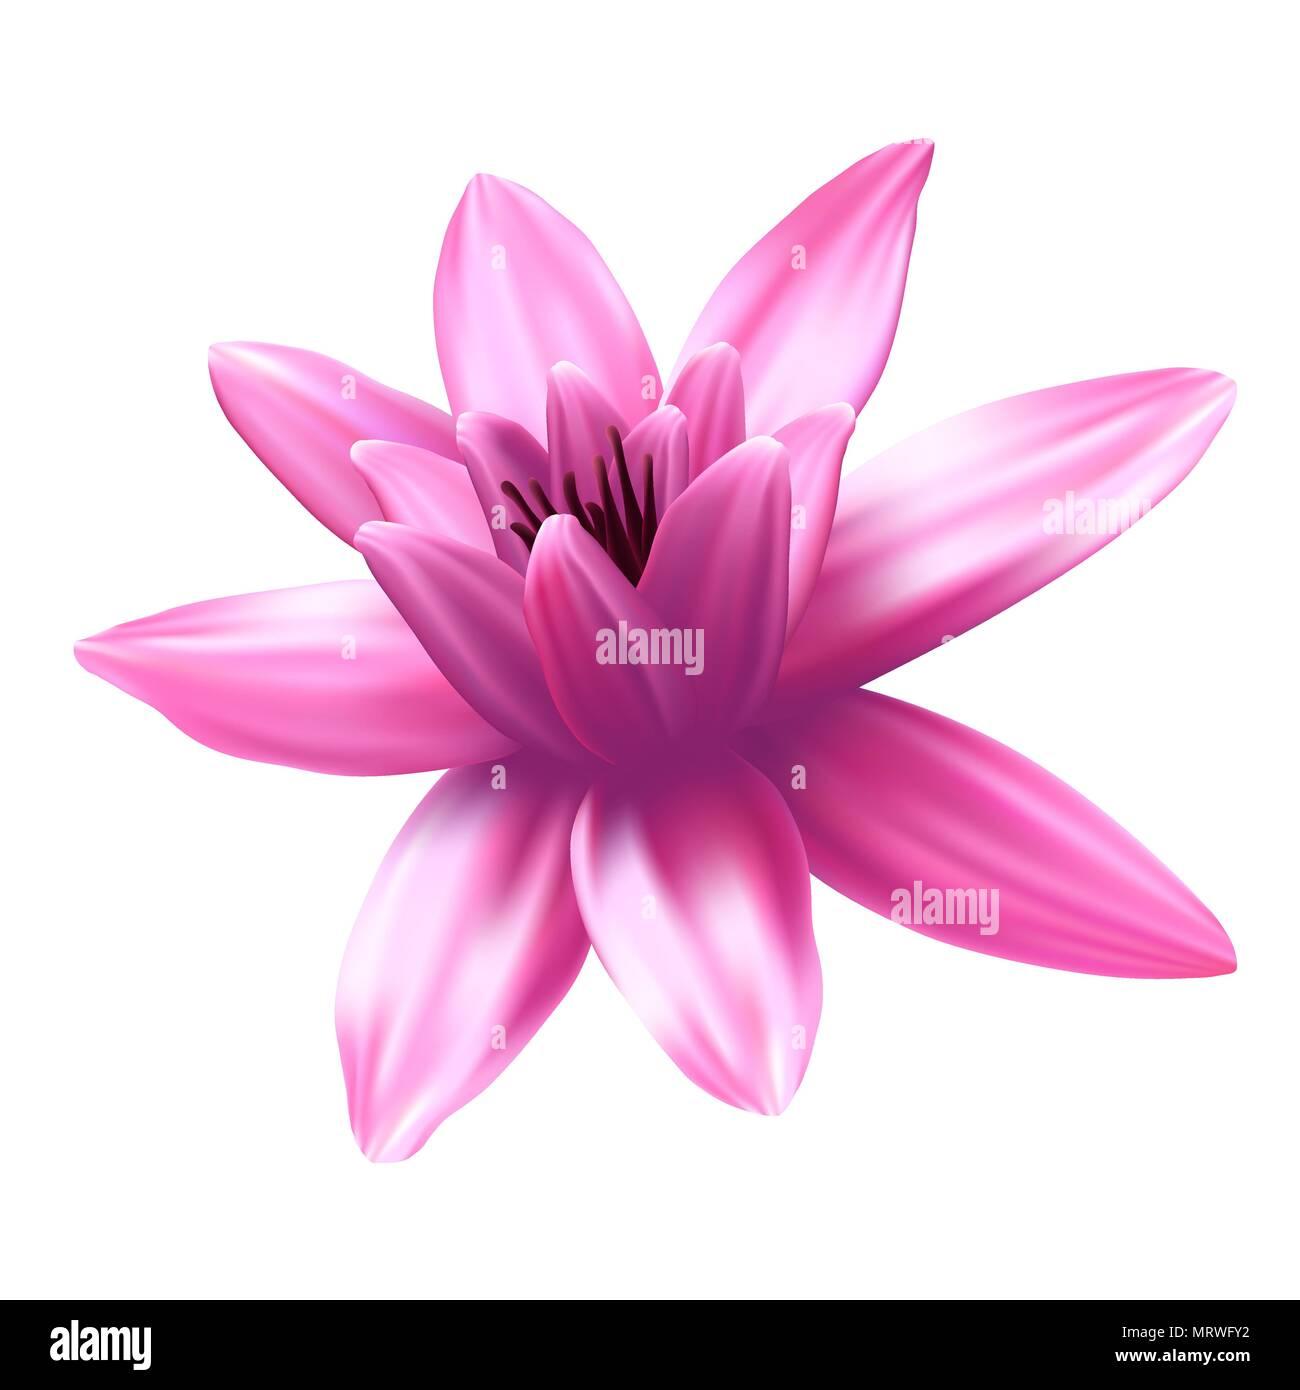 Lotus flower isolated on white background stock vector art lotus flower isolated on white background izmirmasajfo